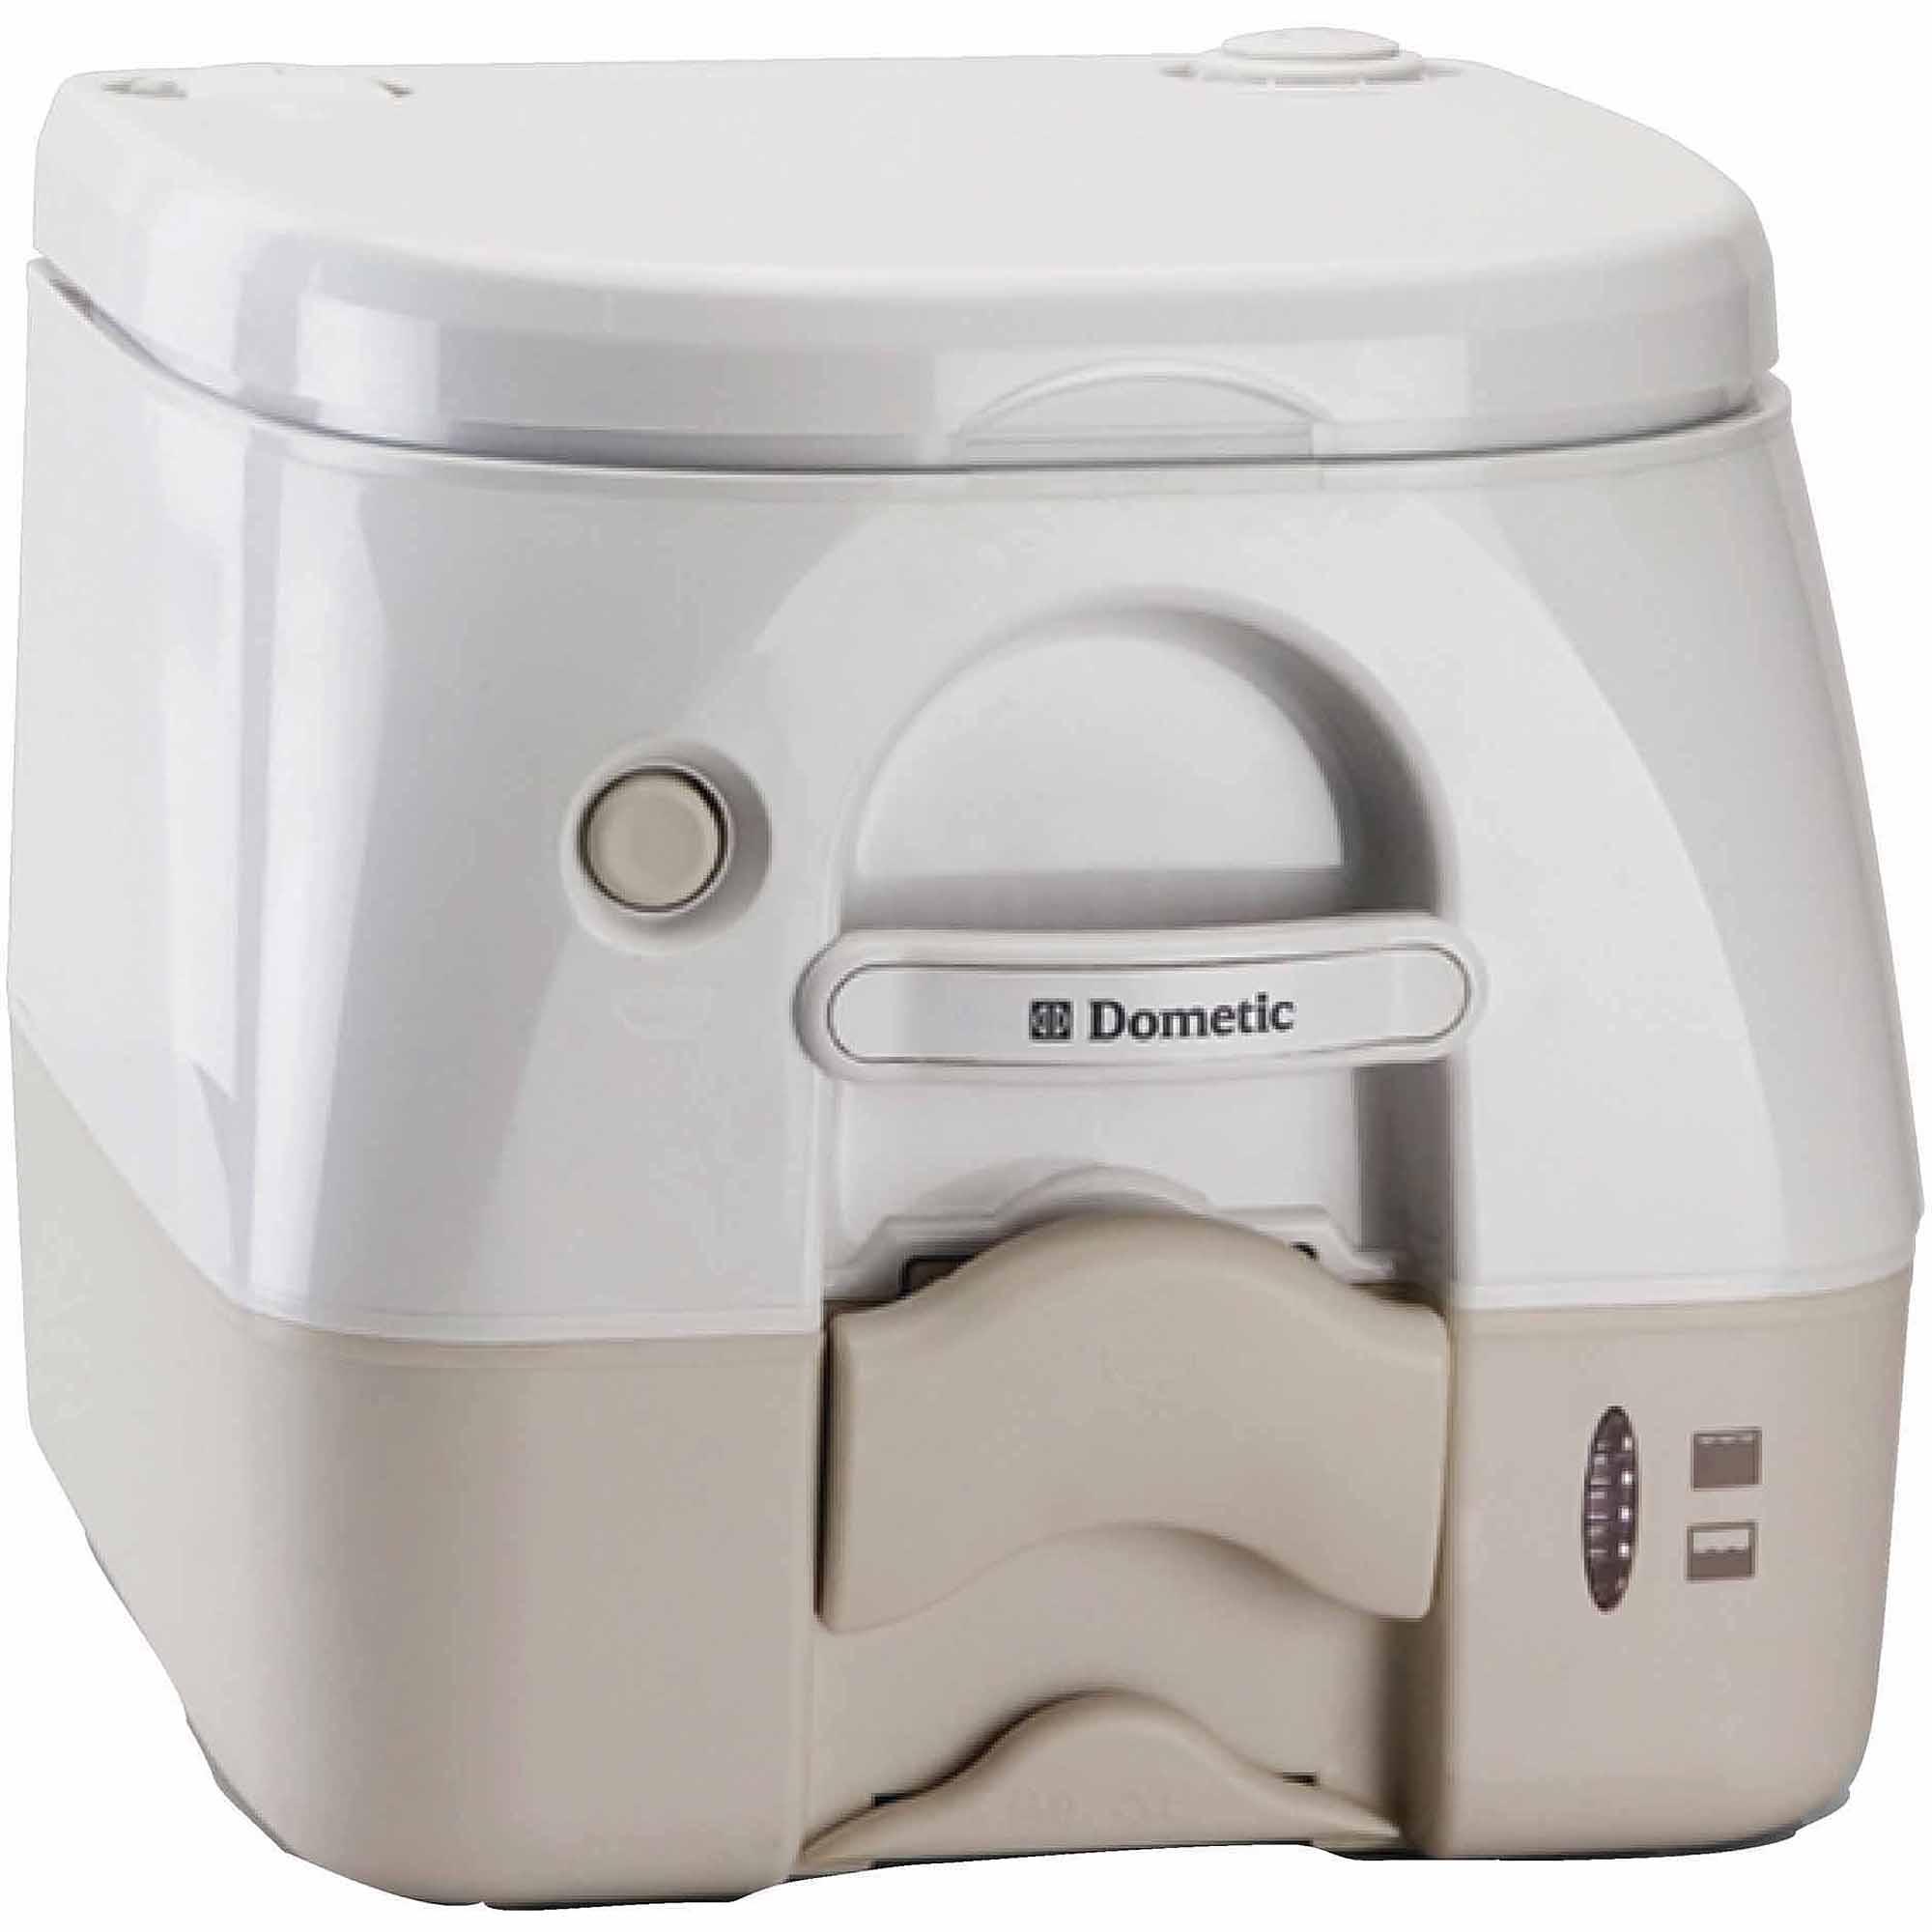 SeaLand 2.5 Gallon Full Size SaniPottie 975MSD Portable Toilet with Push Button Flush